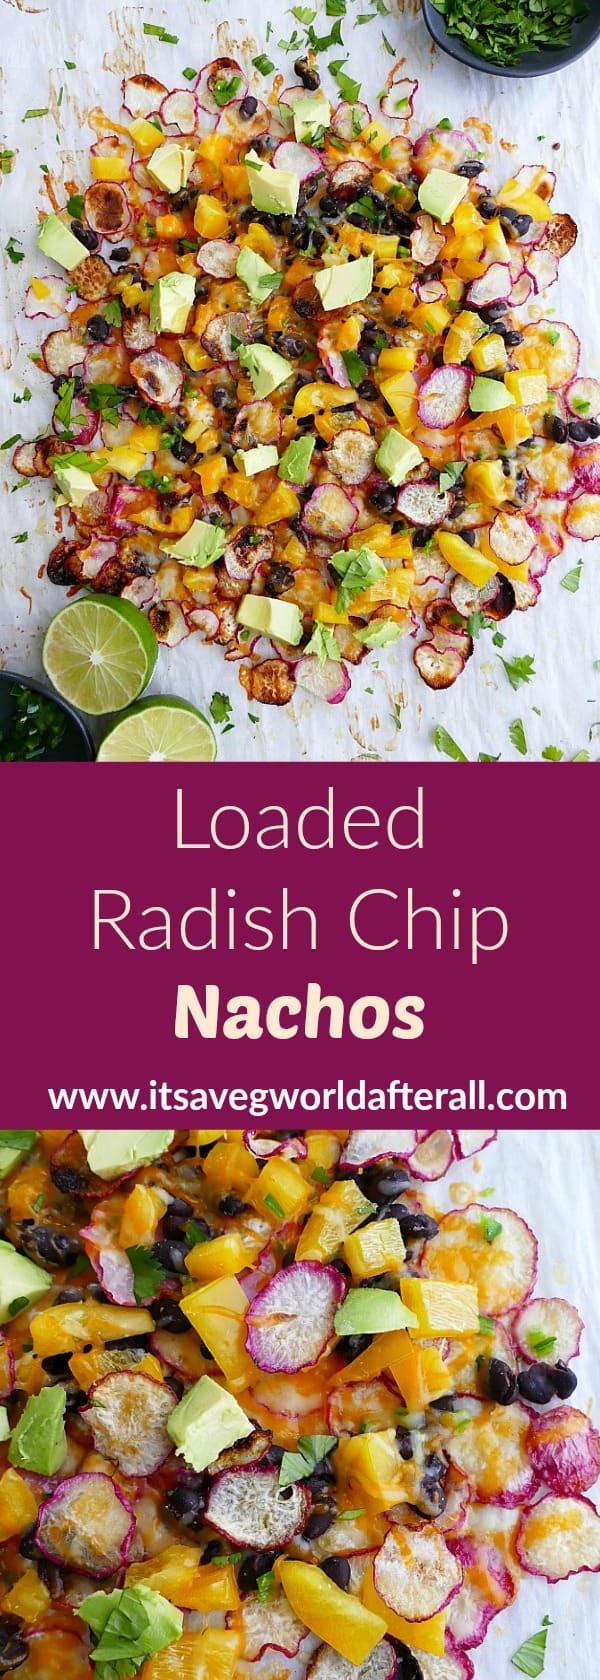 Loaded Radish Chip Nachos pin